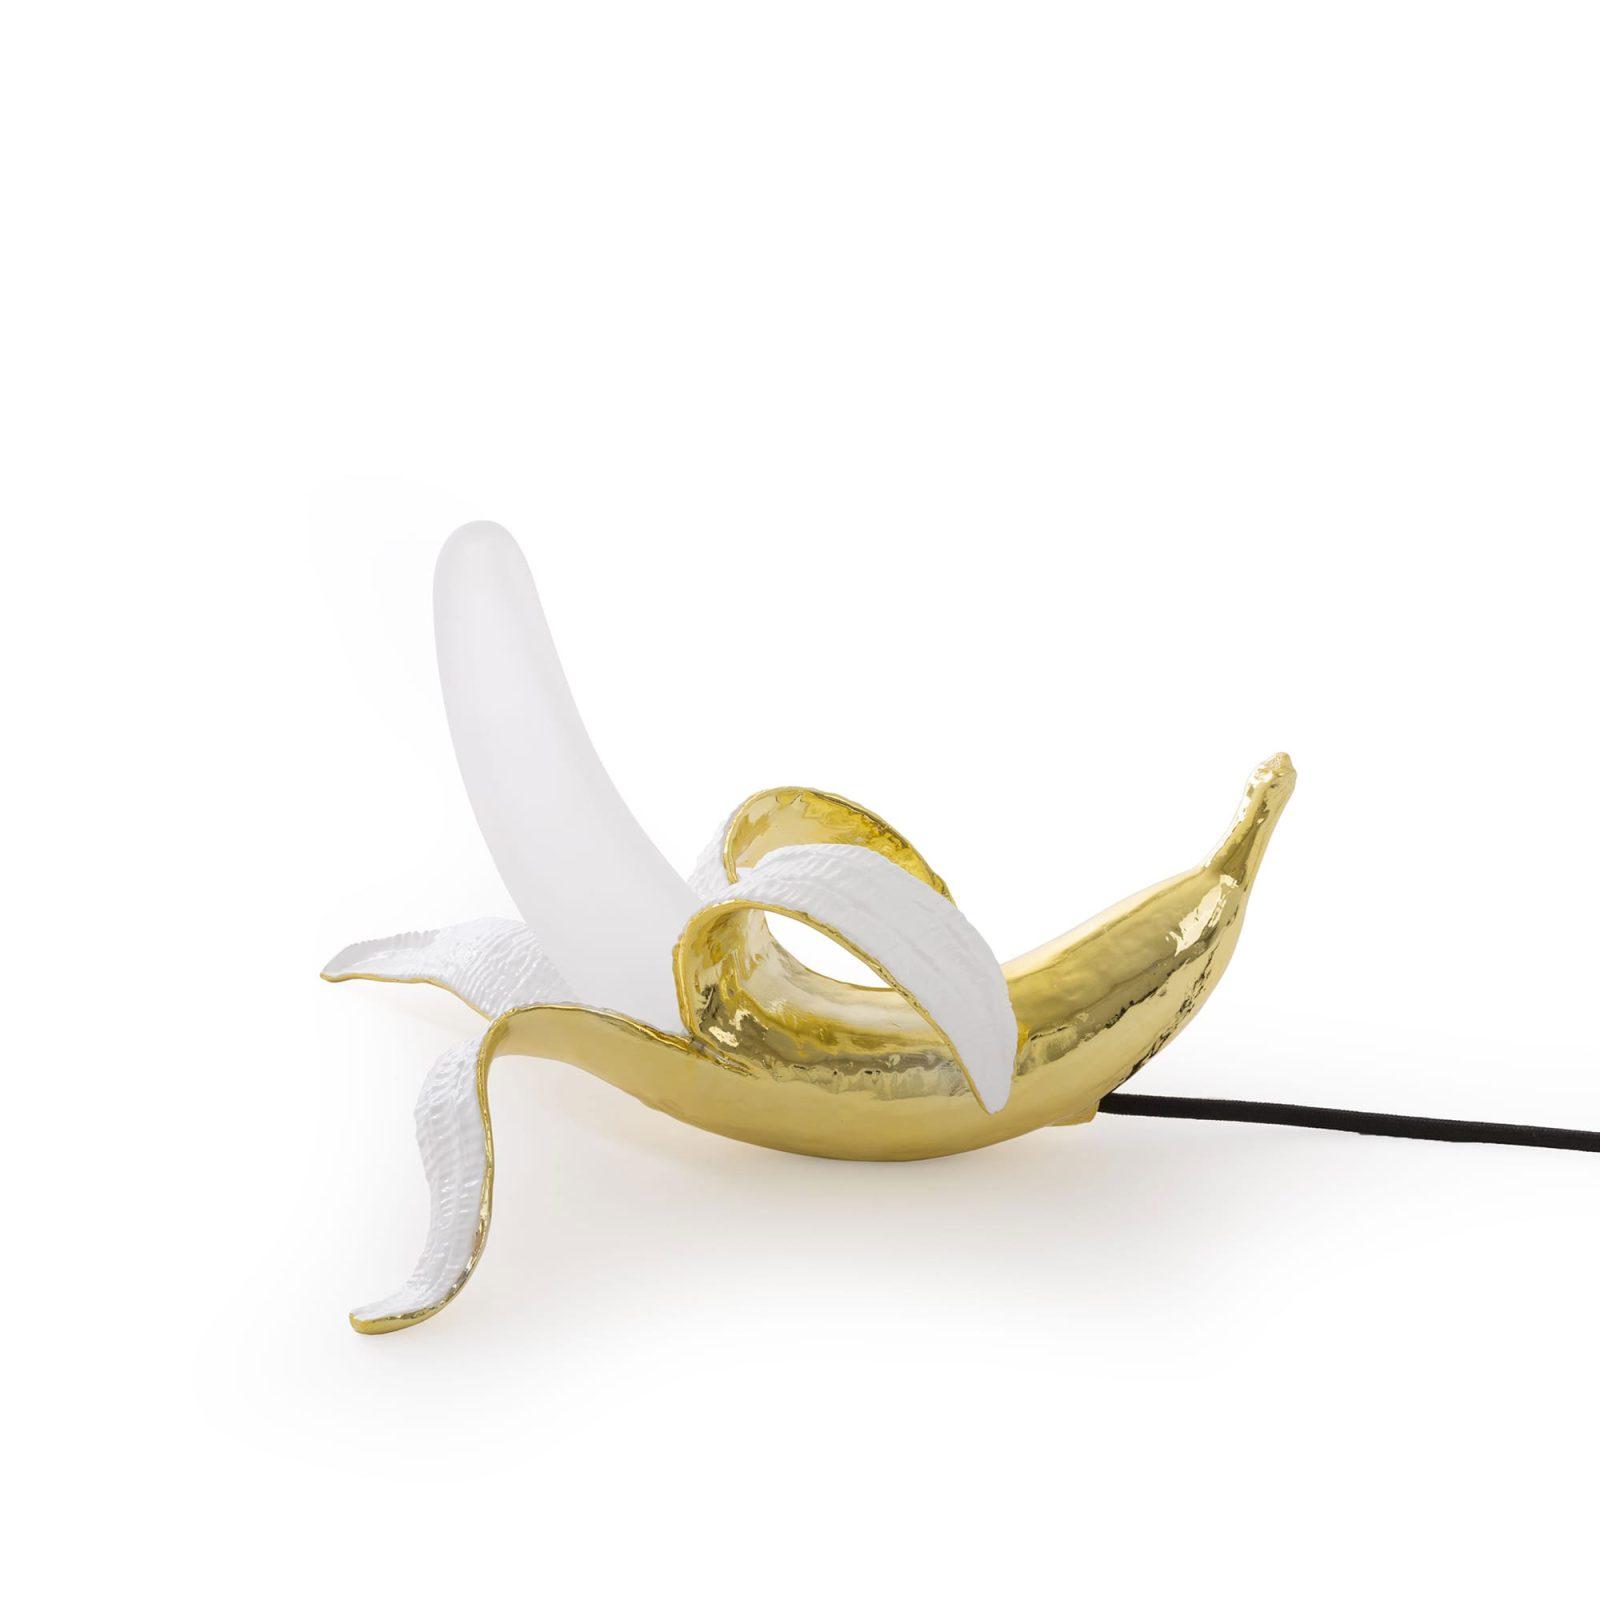 Banana Lamp, Huey-34338